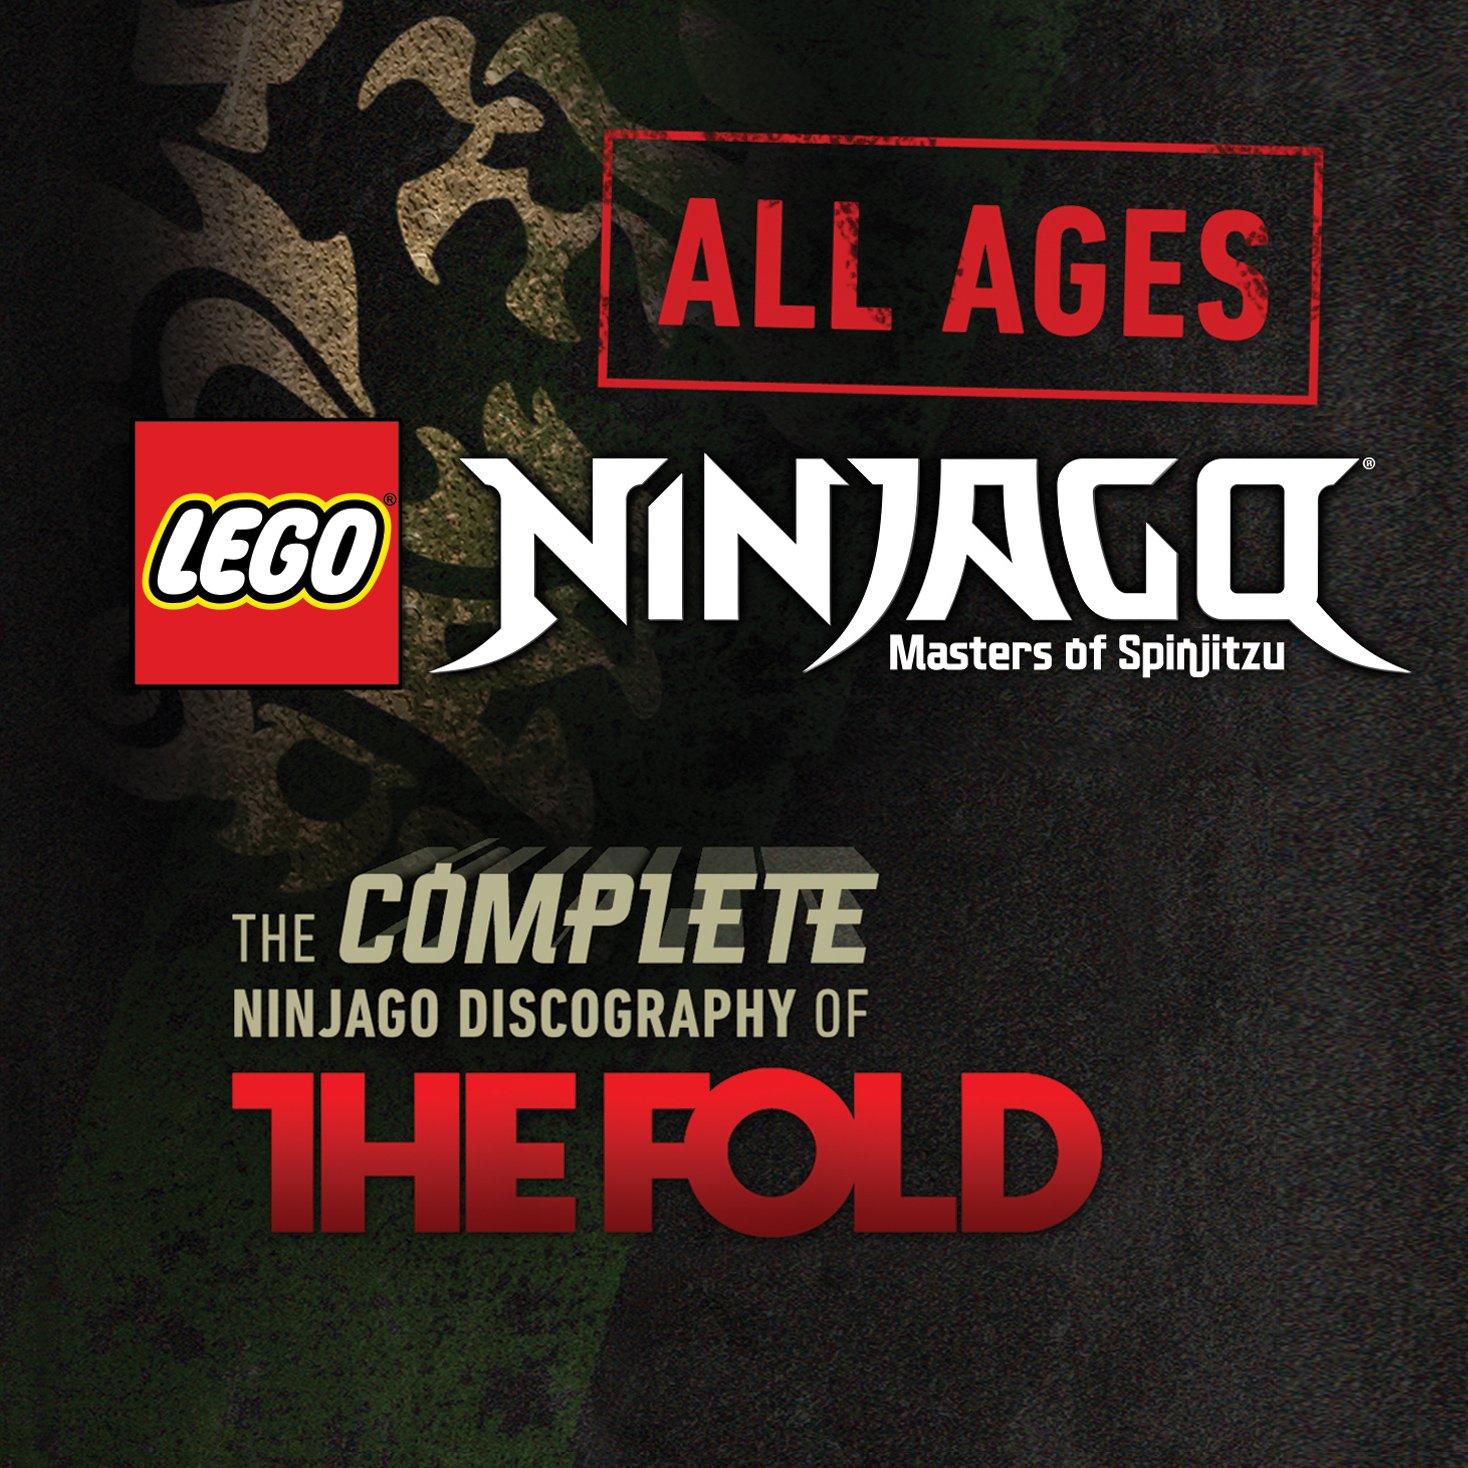 LEGO Ninjago All Ages — The Folds Complete Ninjago Discography Double CD